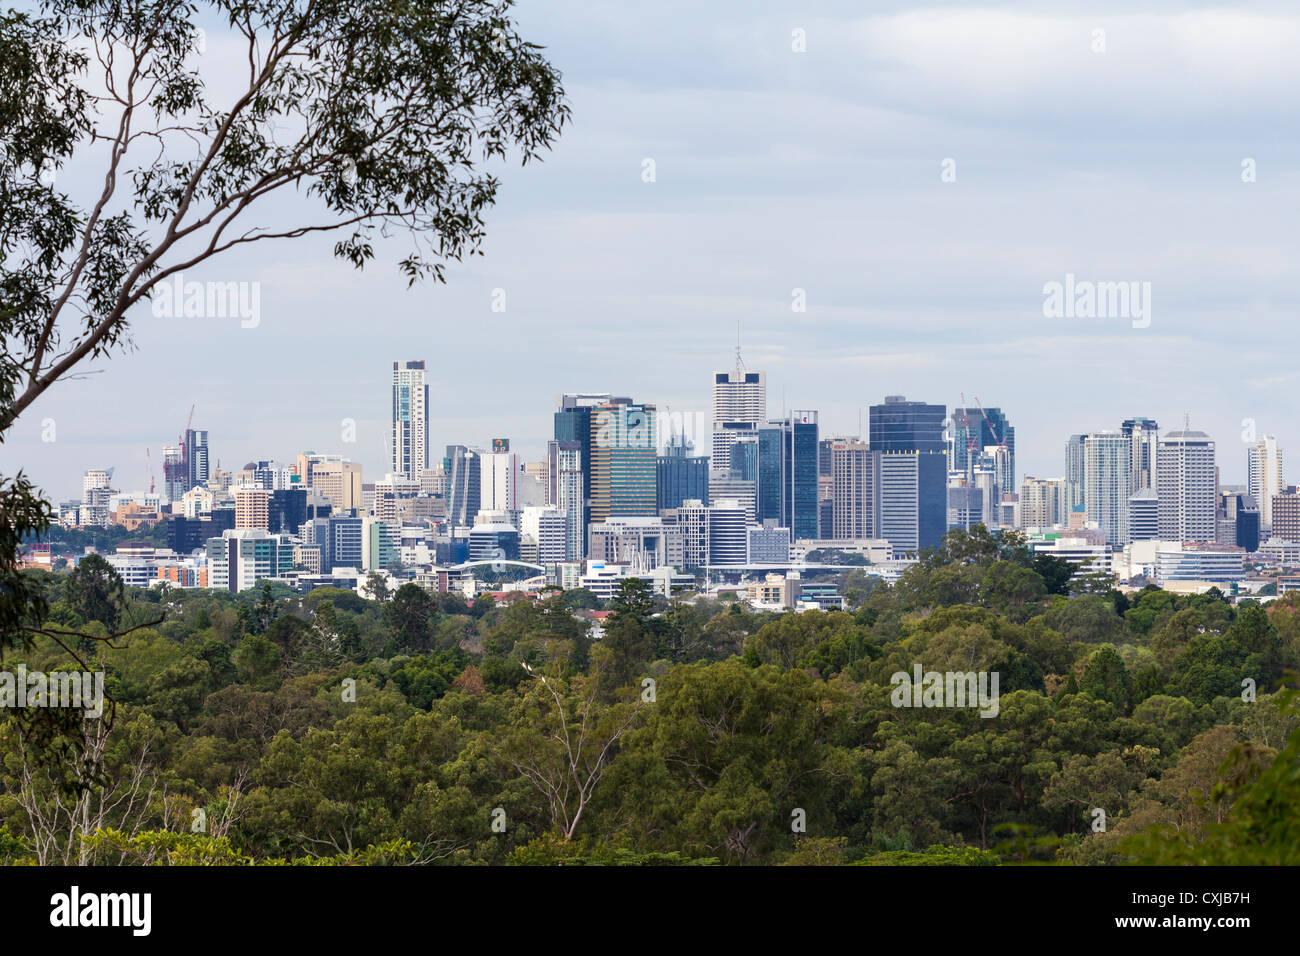 Brisbane city skyline from Mount Coot-Tha, Queensland, Australia - Stock Image